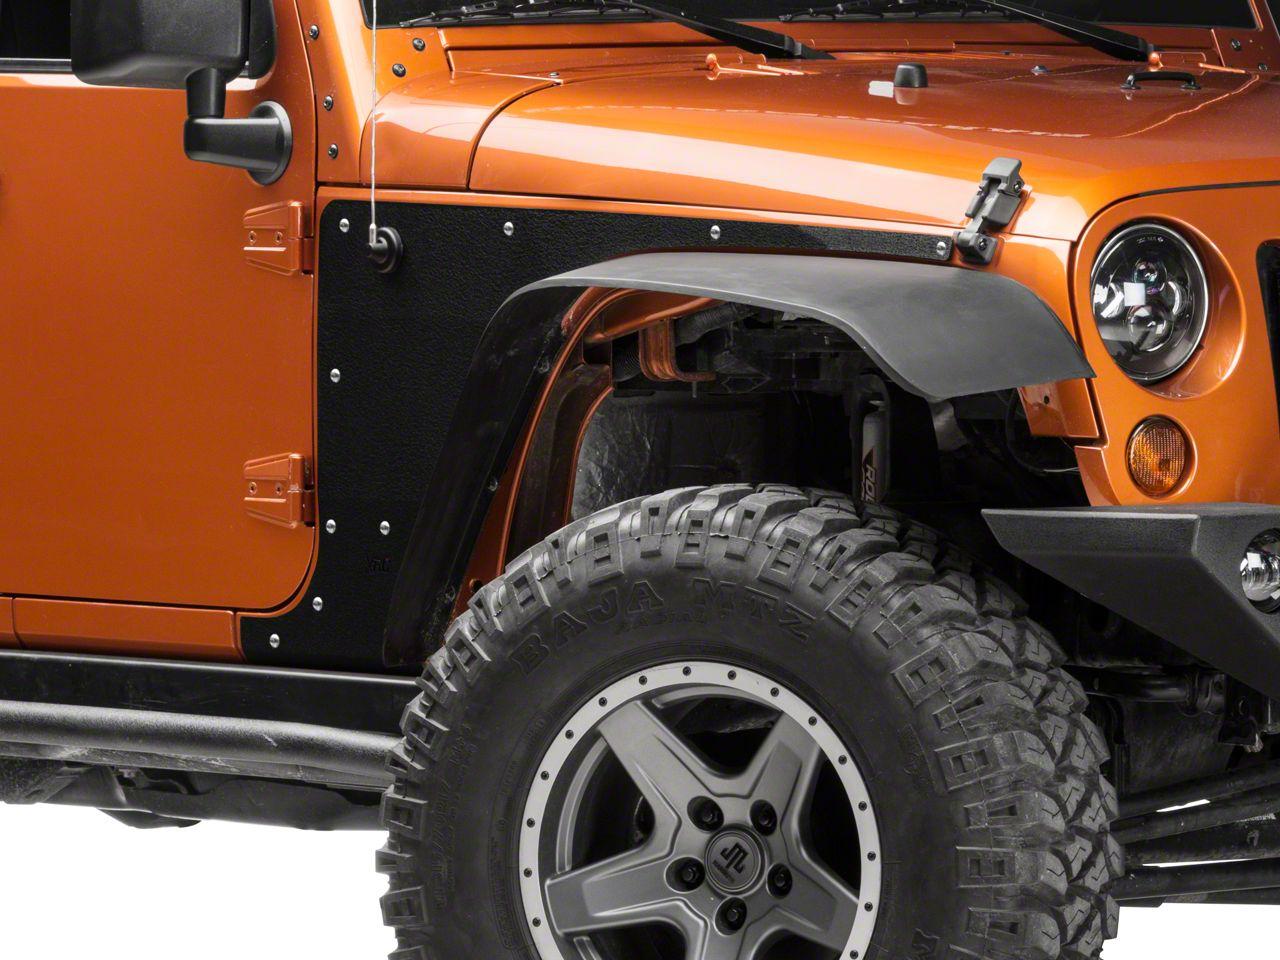 Smittybilt Front XRC Body Armor Skins - Textured Matte Black (07-18 Jeep Wrangler JK)